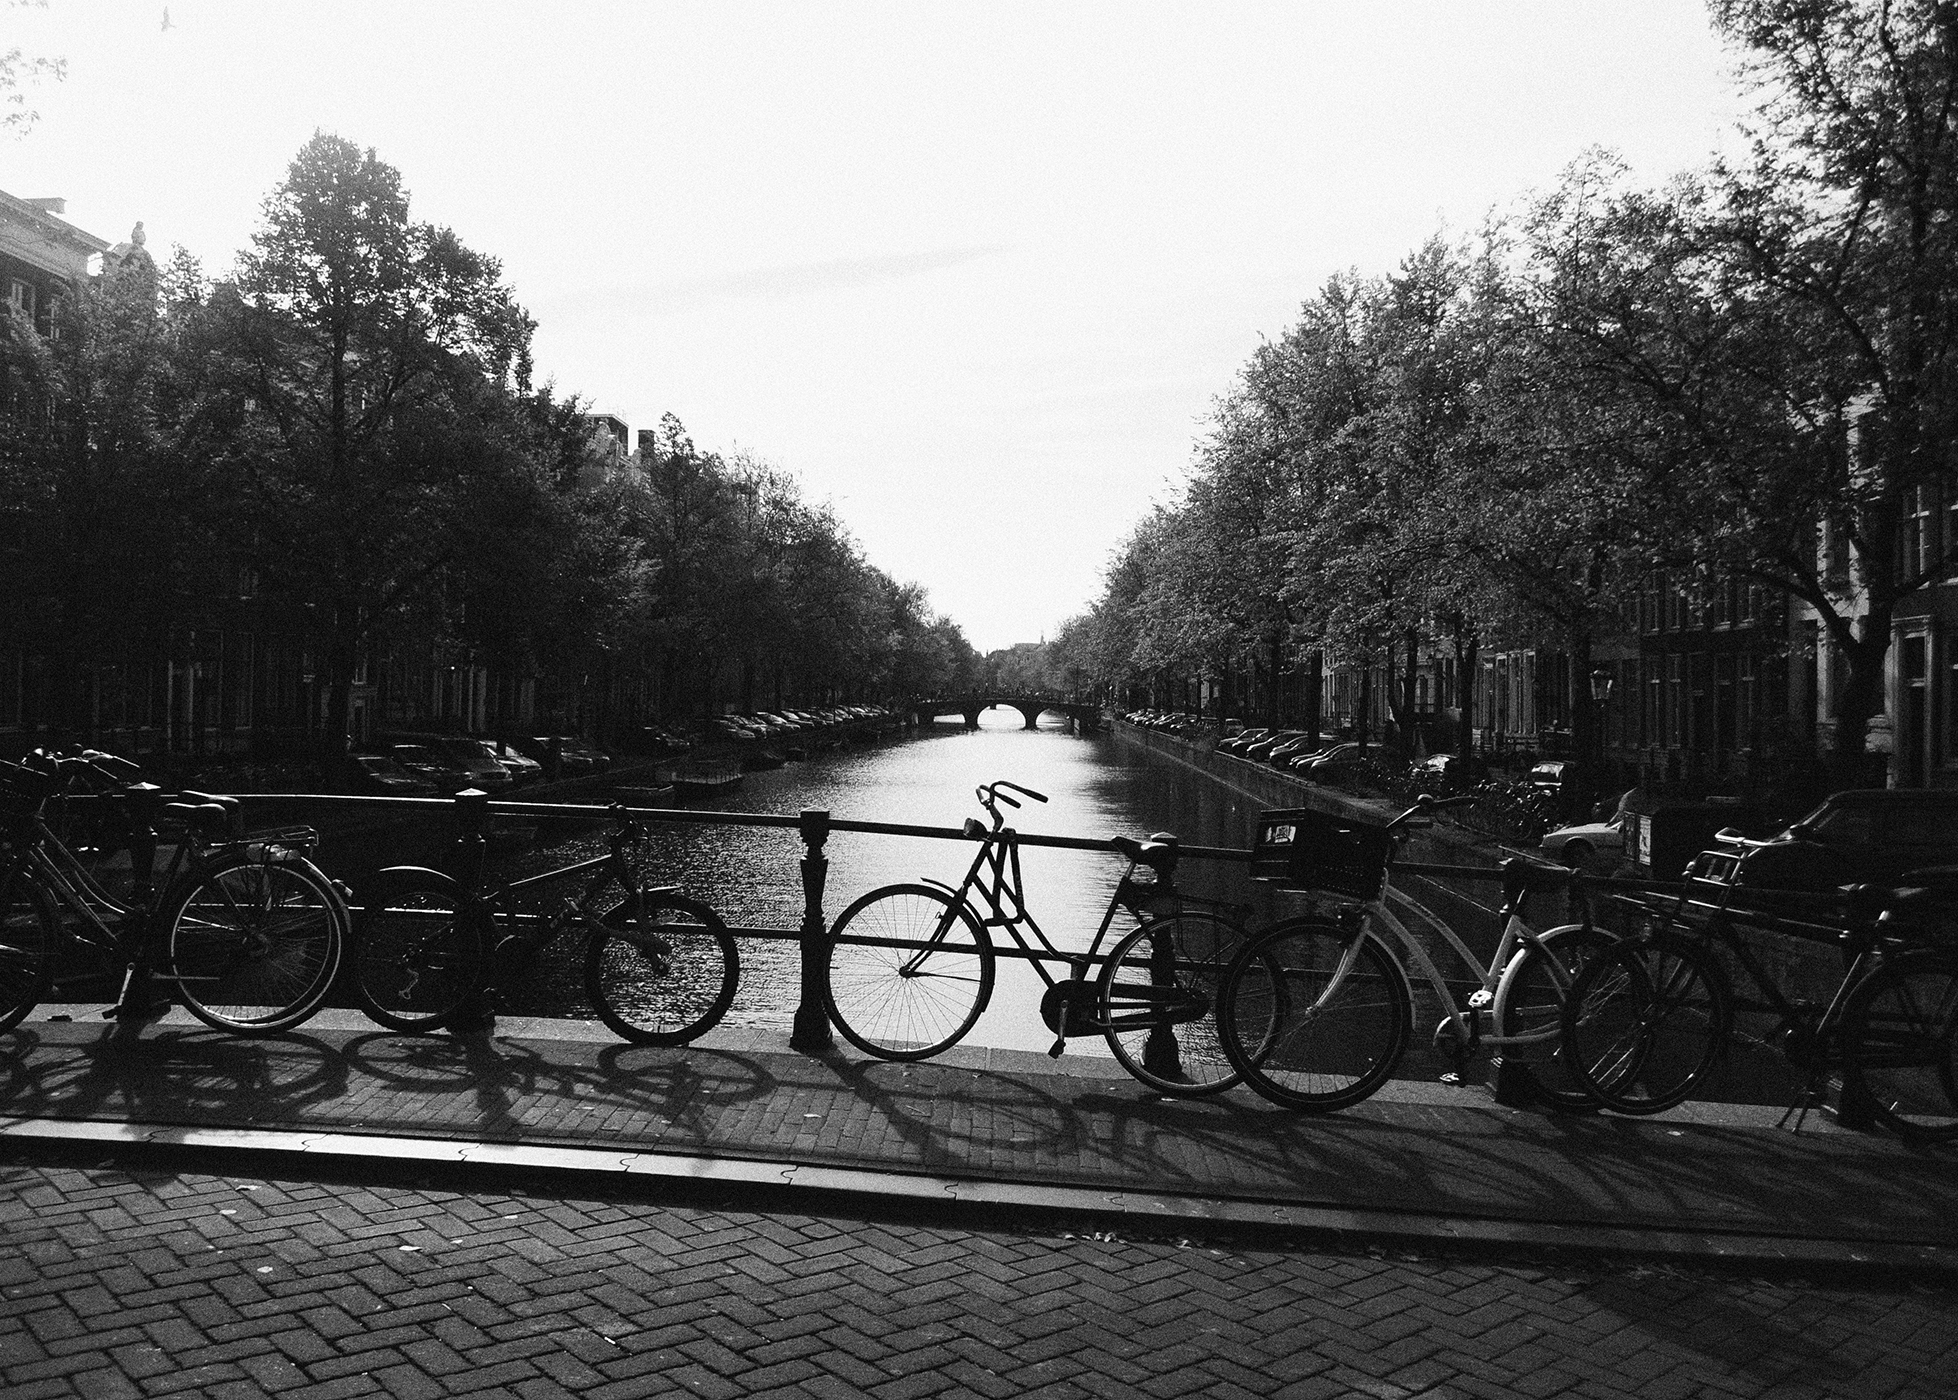 Amsterdam, I Love You